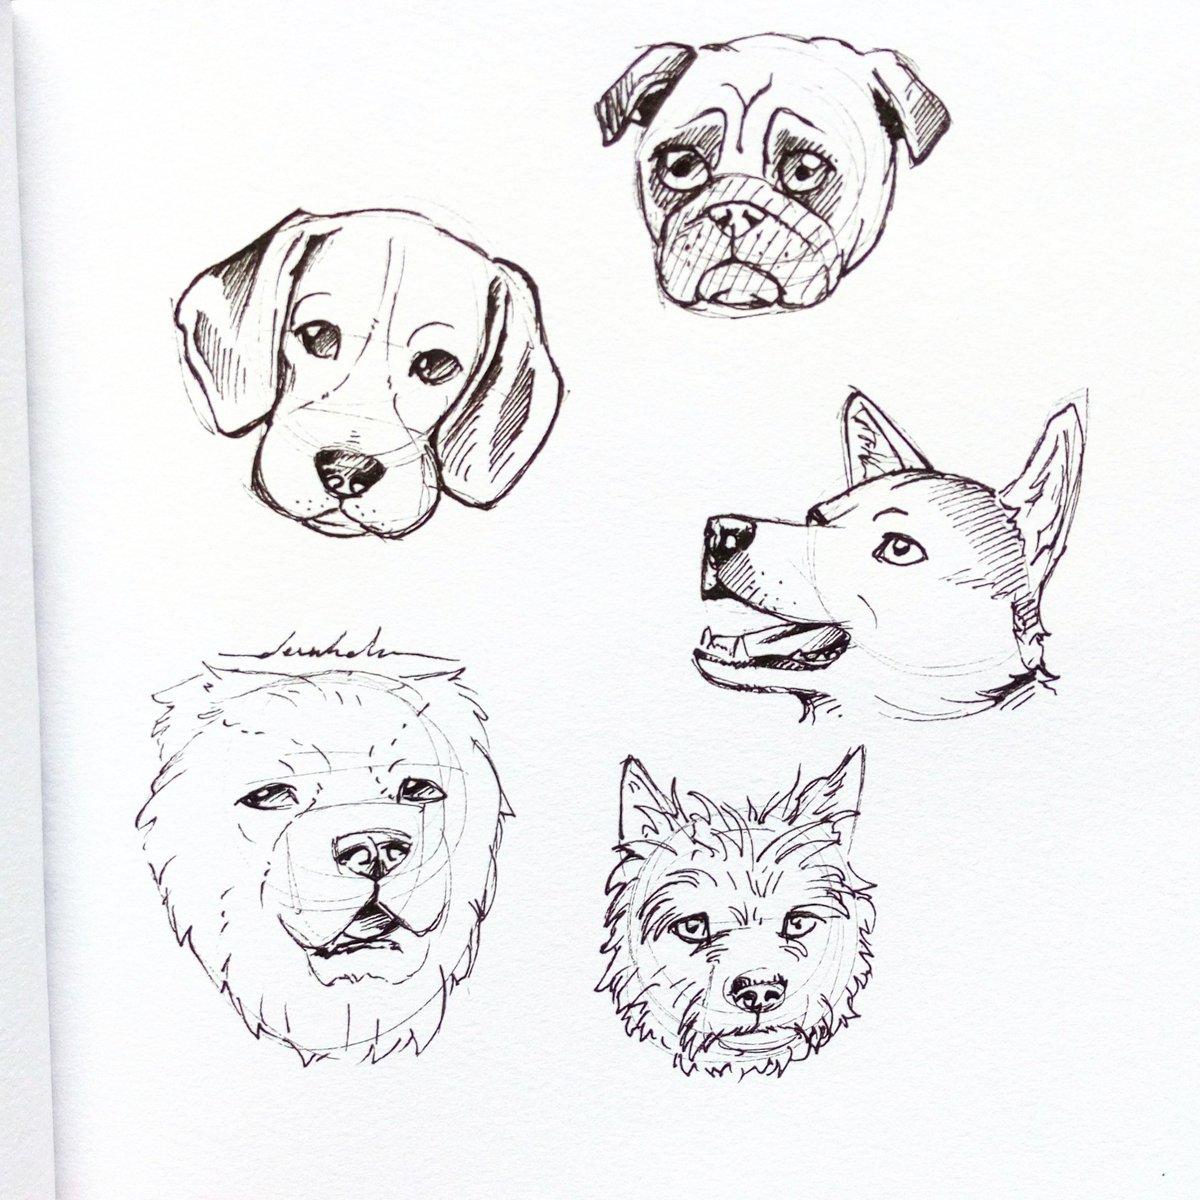 Dogs #dailyart #dailyillustration #dogs #dog #pets #animals #blackandwhitedrawing https://t.co/FAqSxQnUcz